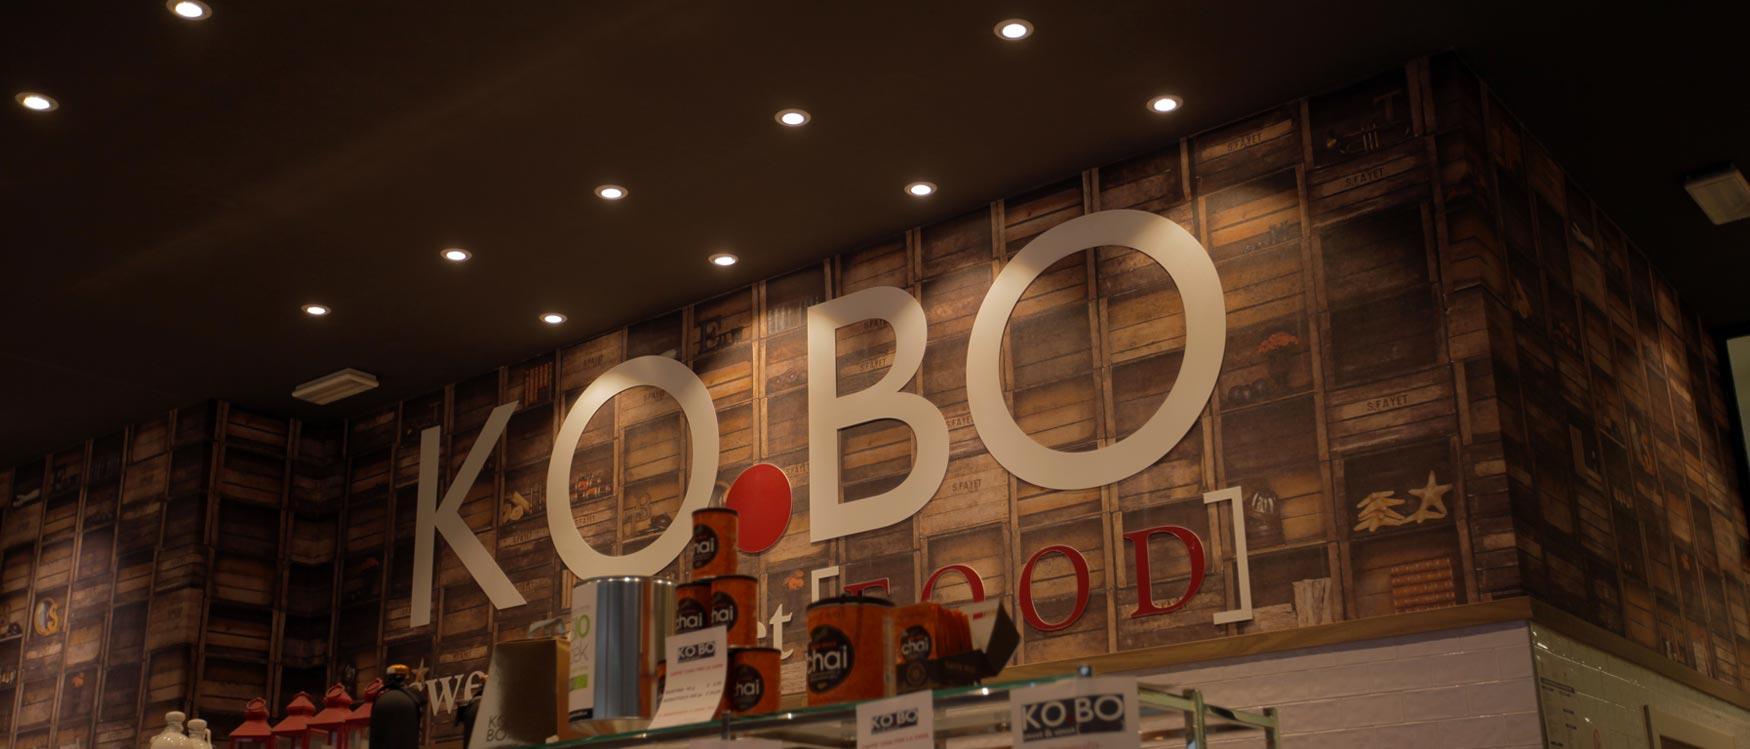 street food kobo